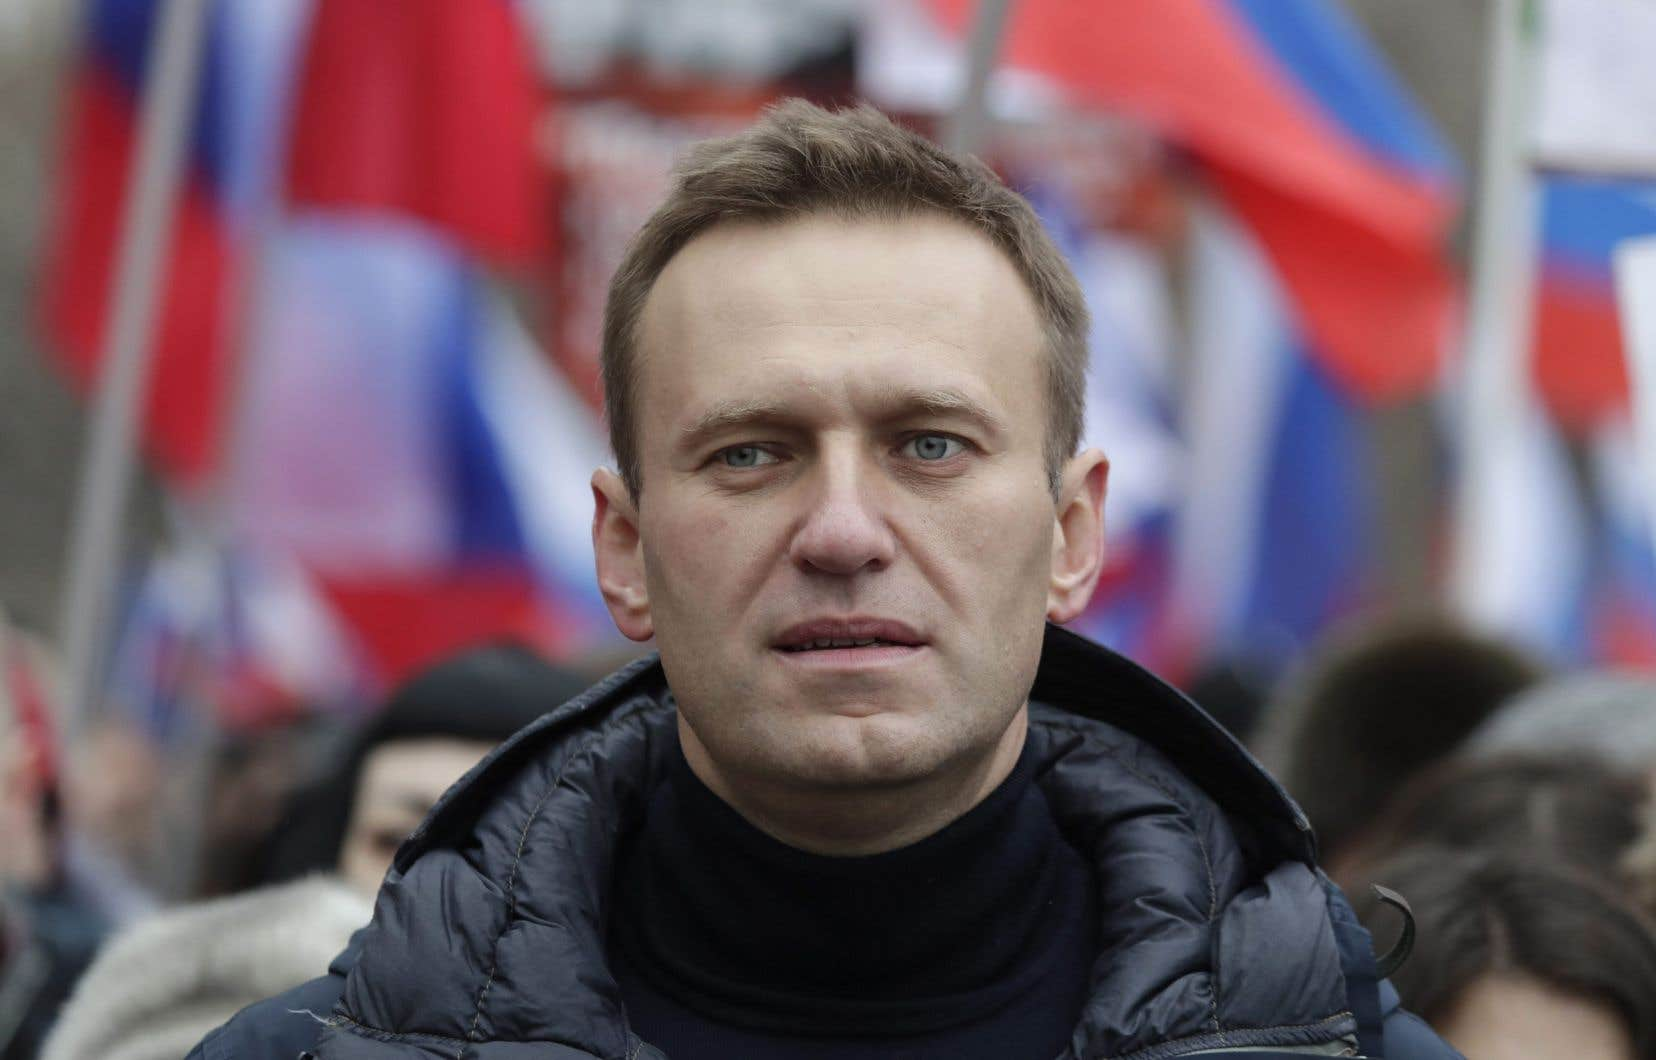 L'opposant Alexeï Navalny, photographié ici en février 2019.